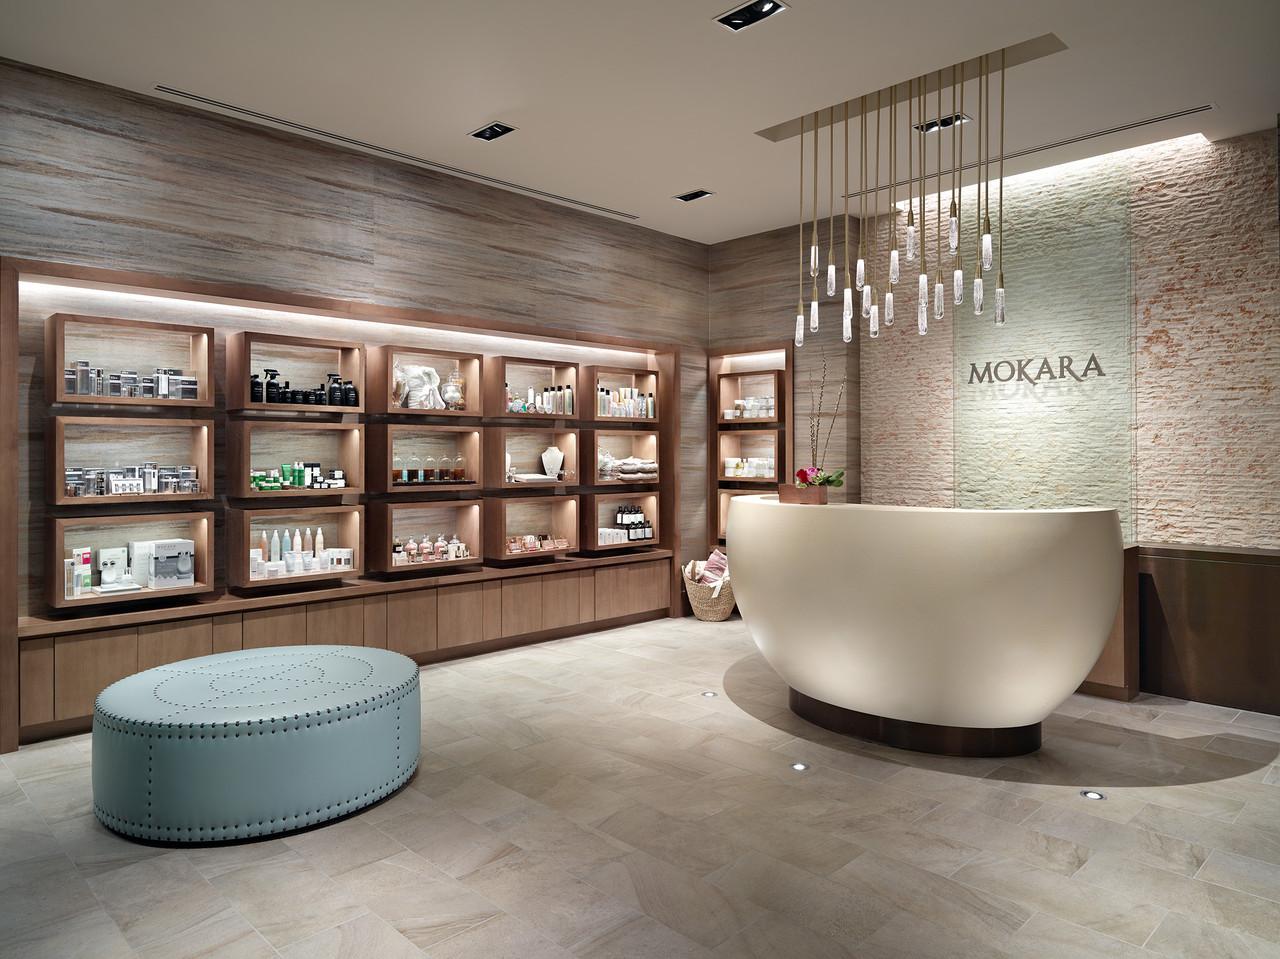 Body Bliss Property Profile - Omni Louisville Hotel Mokara Spa